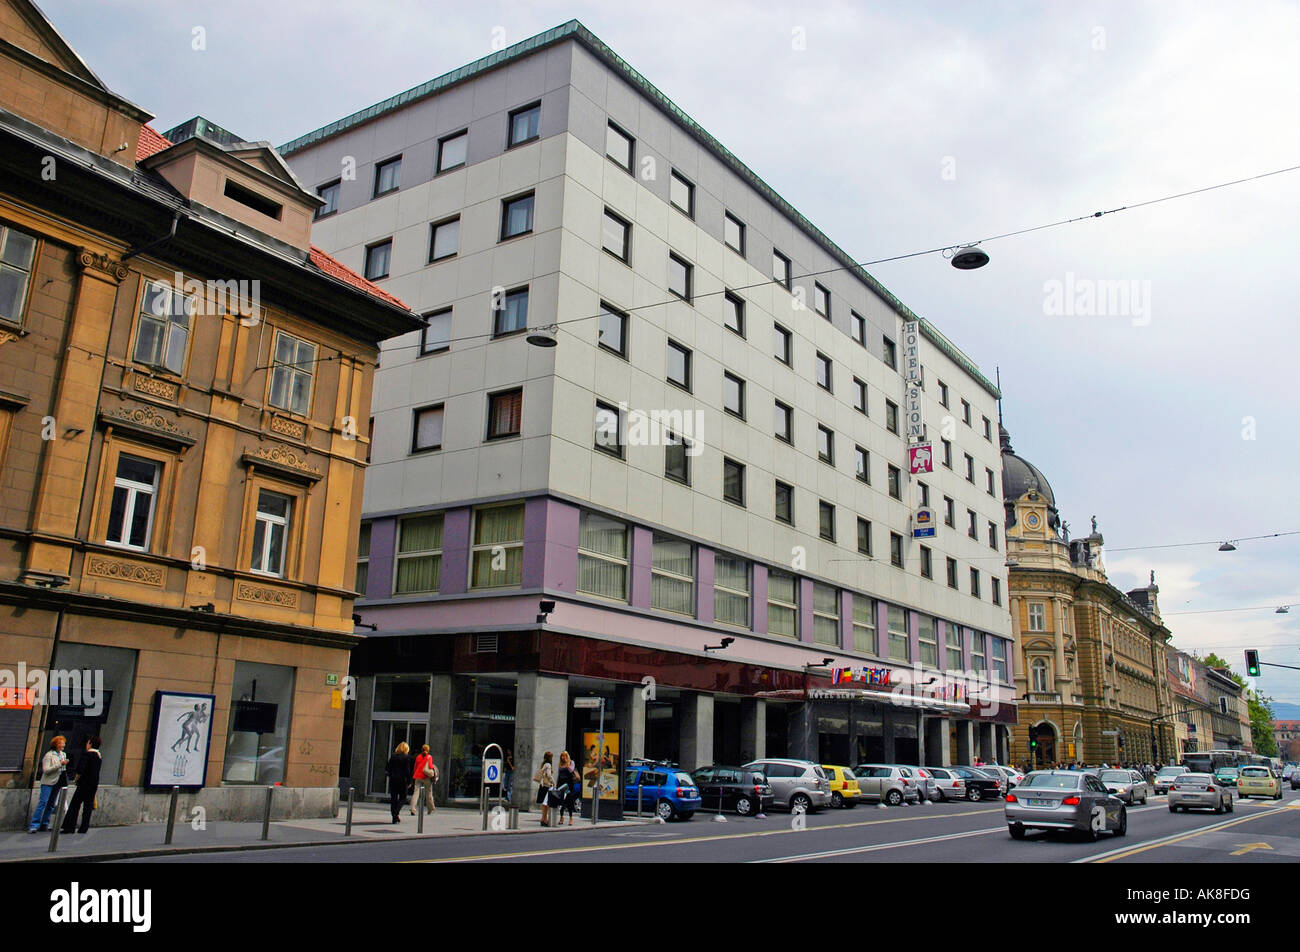 Best Western Premier Hotel Slon / Ljubljana - Stock Image